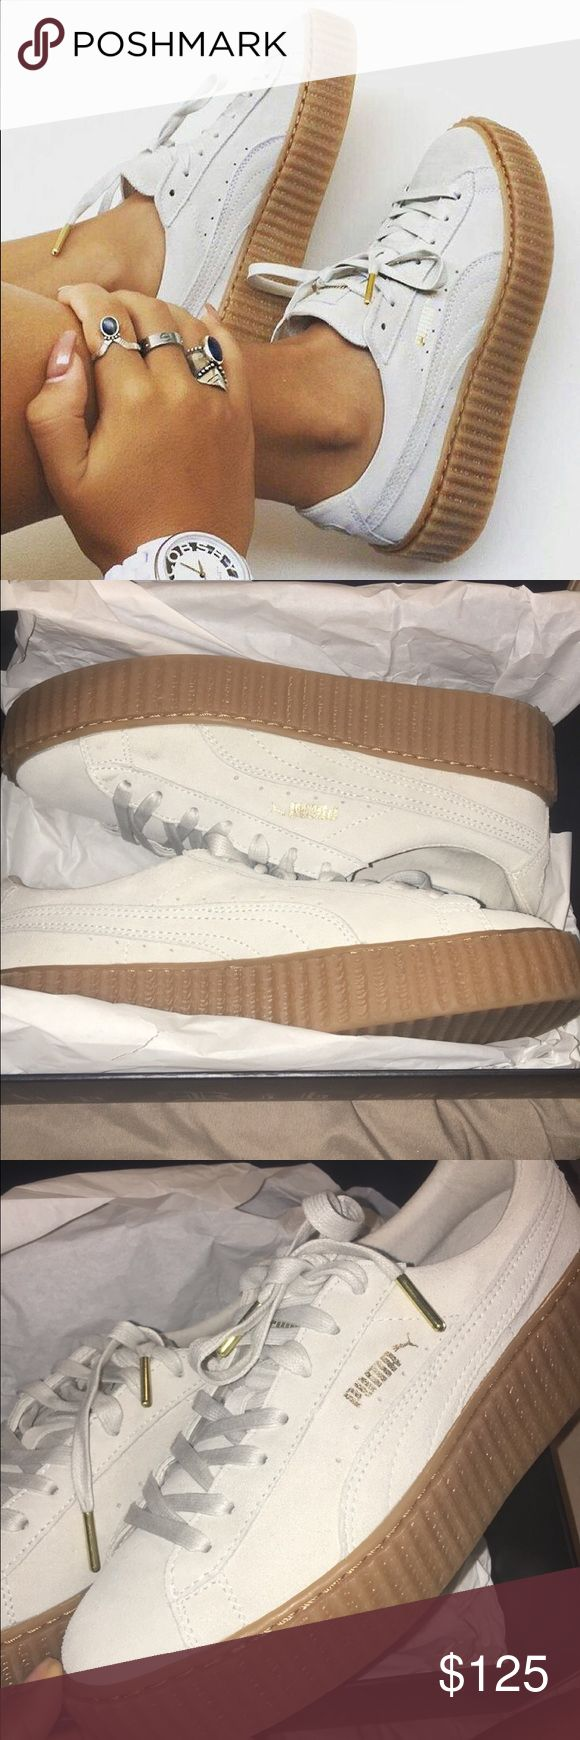 Fairly new Puma Rihanna Creepers White/Oatmeal Rihanna Creepers. Also listed on Ⓜ️erc Puma Shoes Sneakers